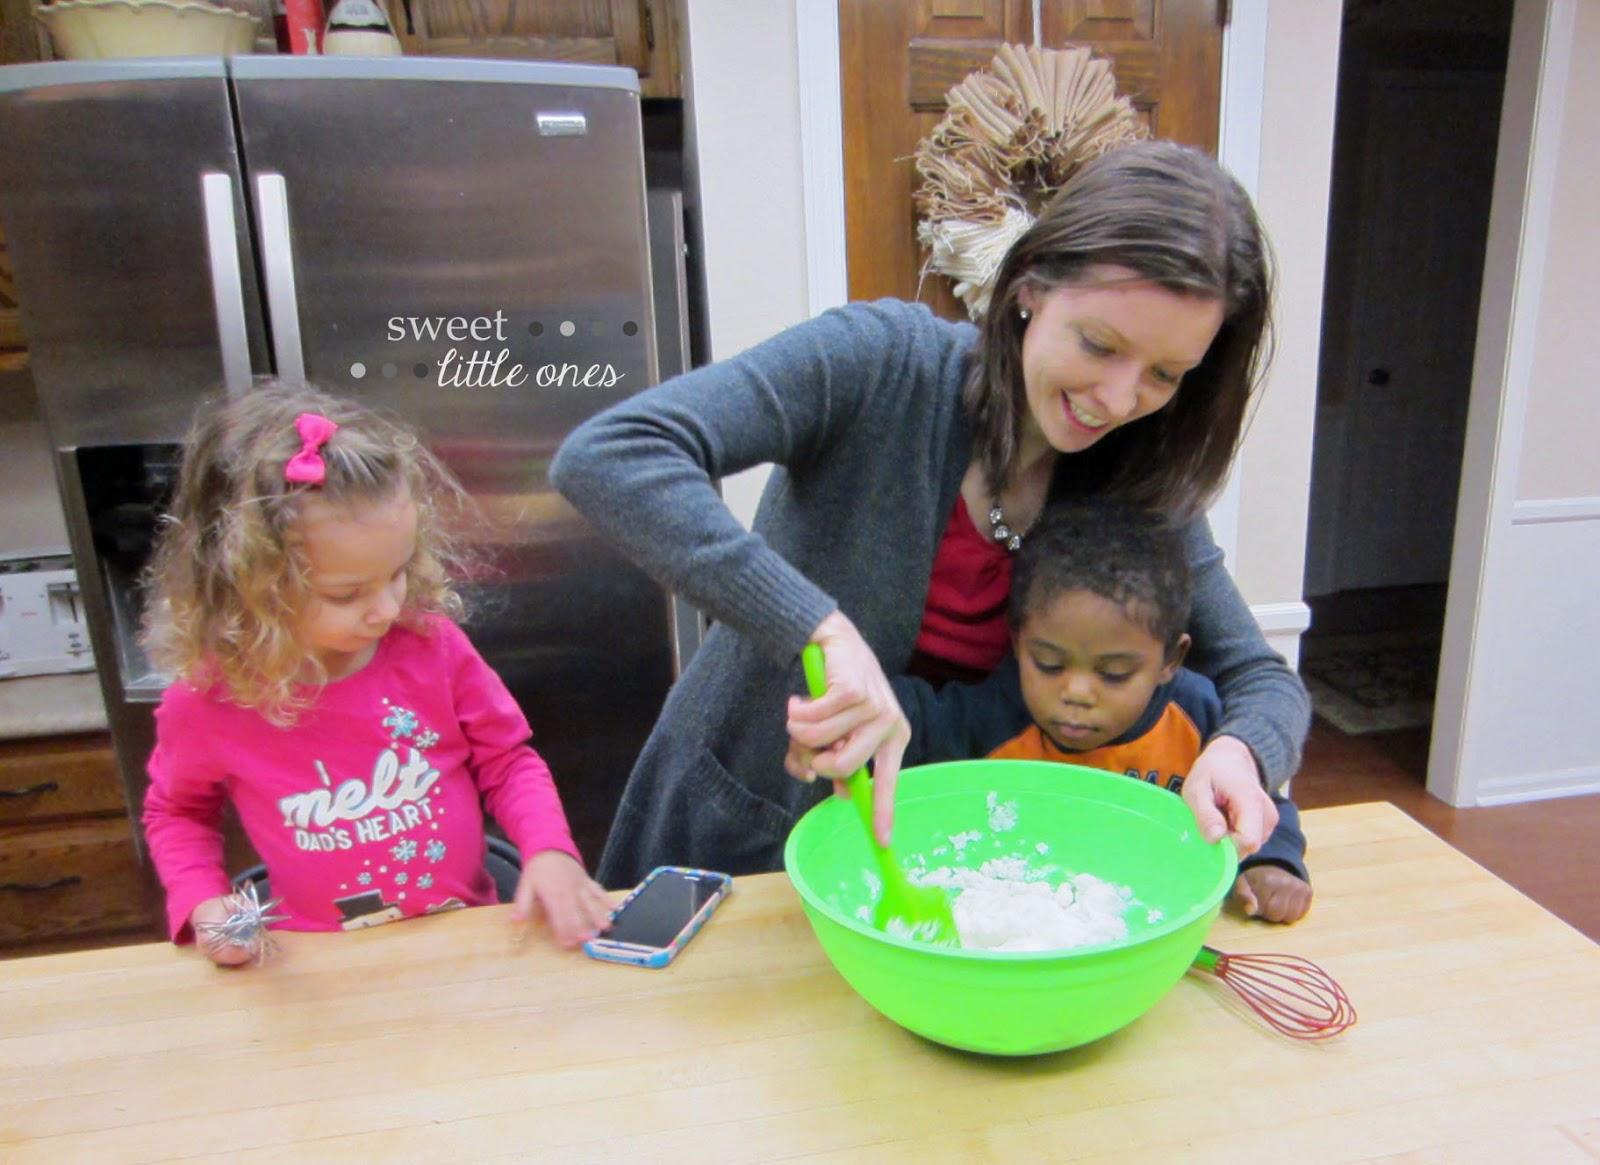 How To Make Snow Ice Cream: Easy Recipe - www.sweetlittleonesblog.com